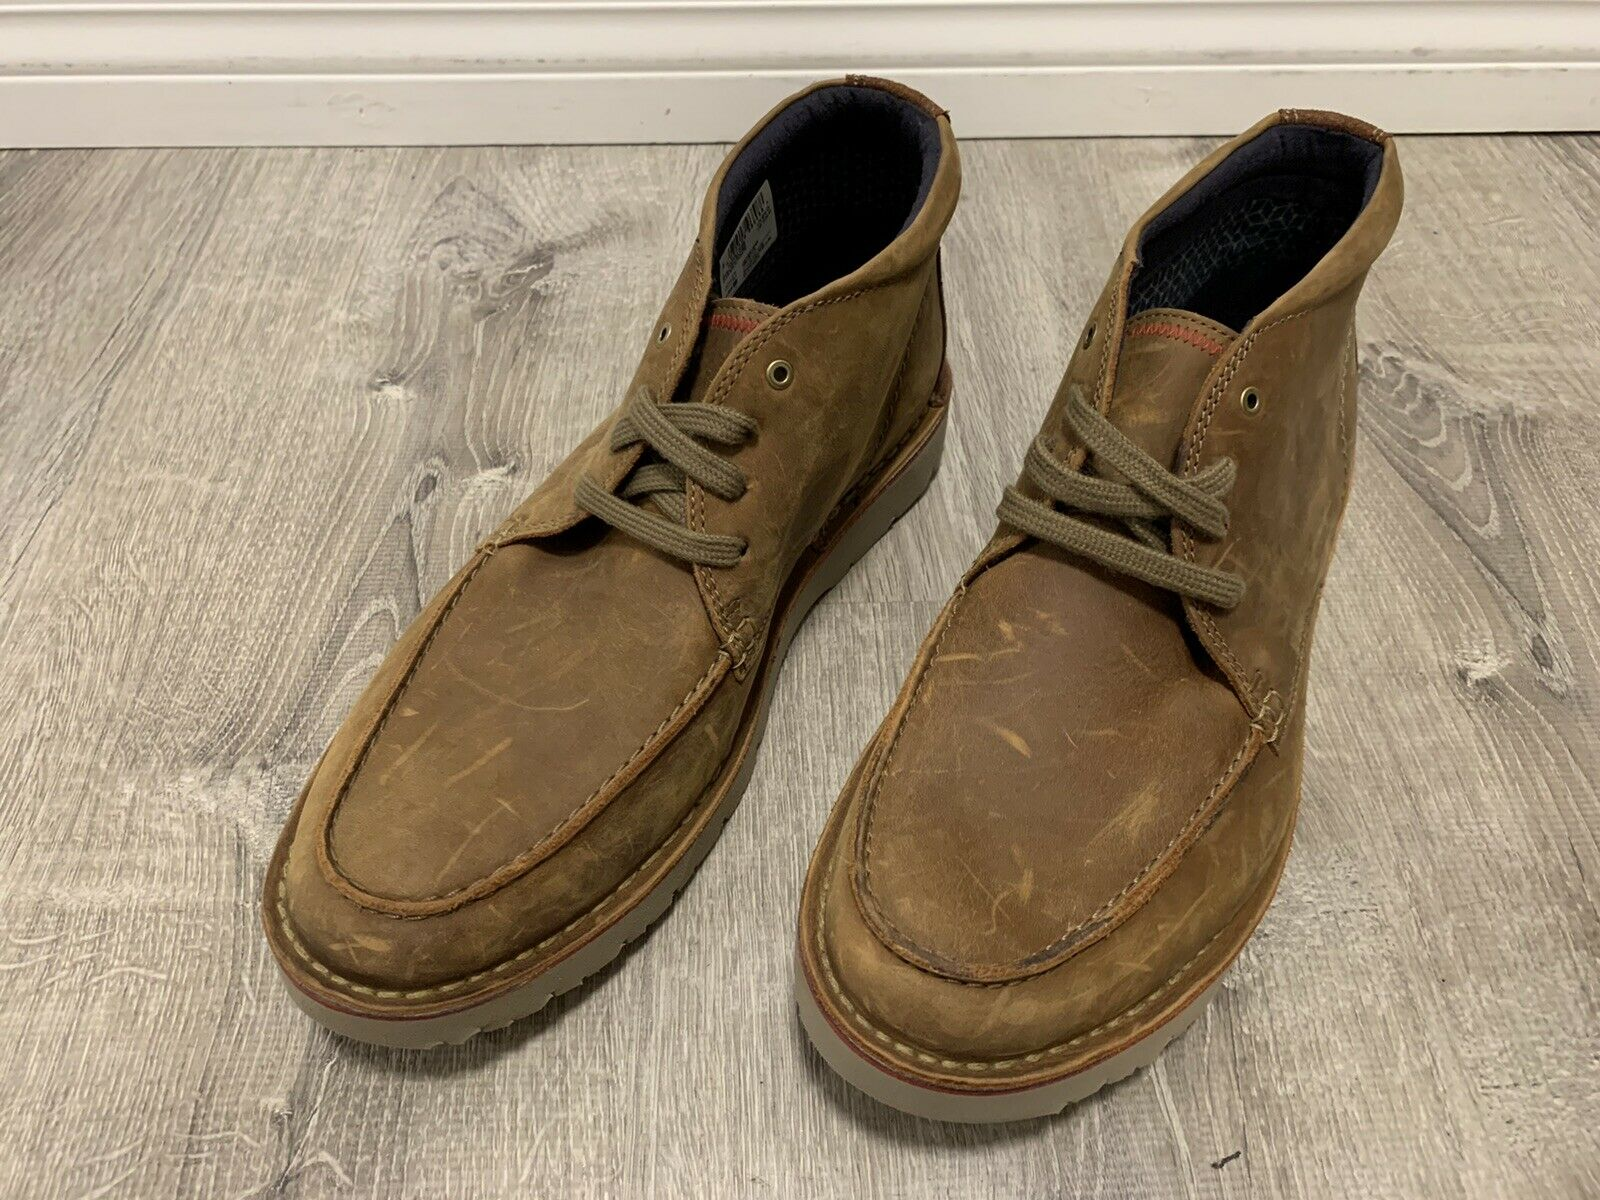 Chukka Boots Dark Tan Leather Size 10.5